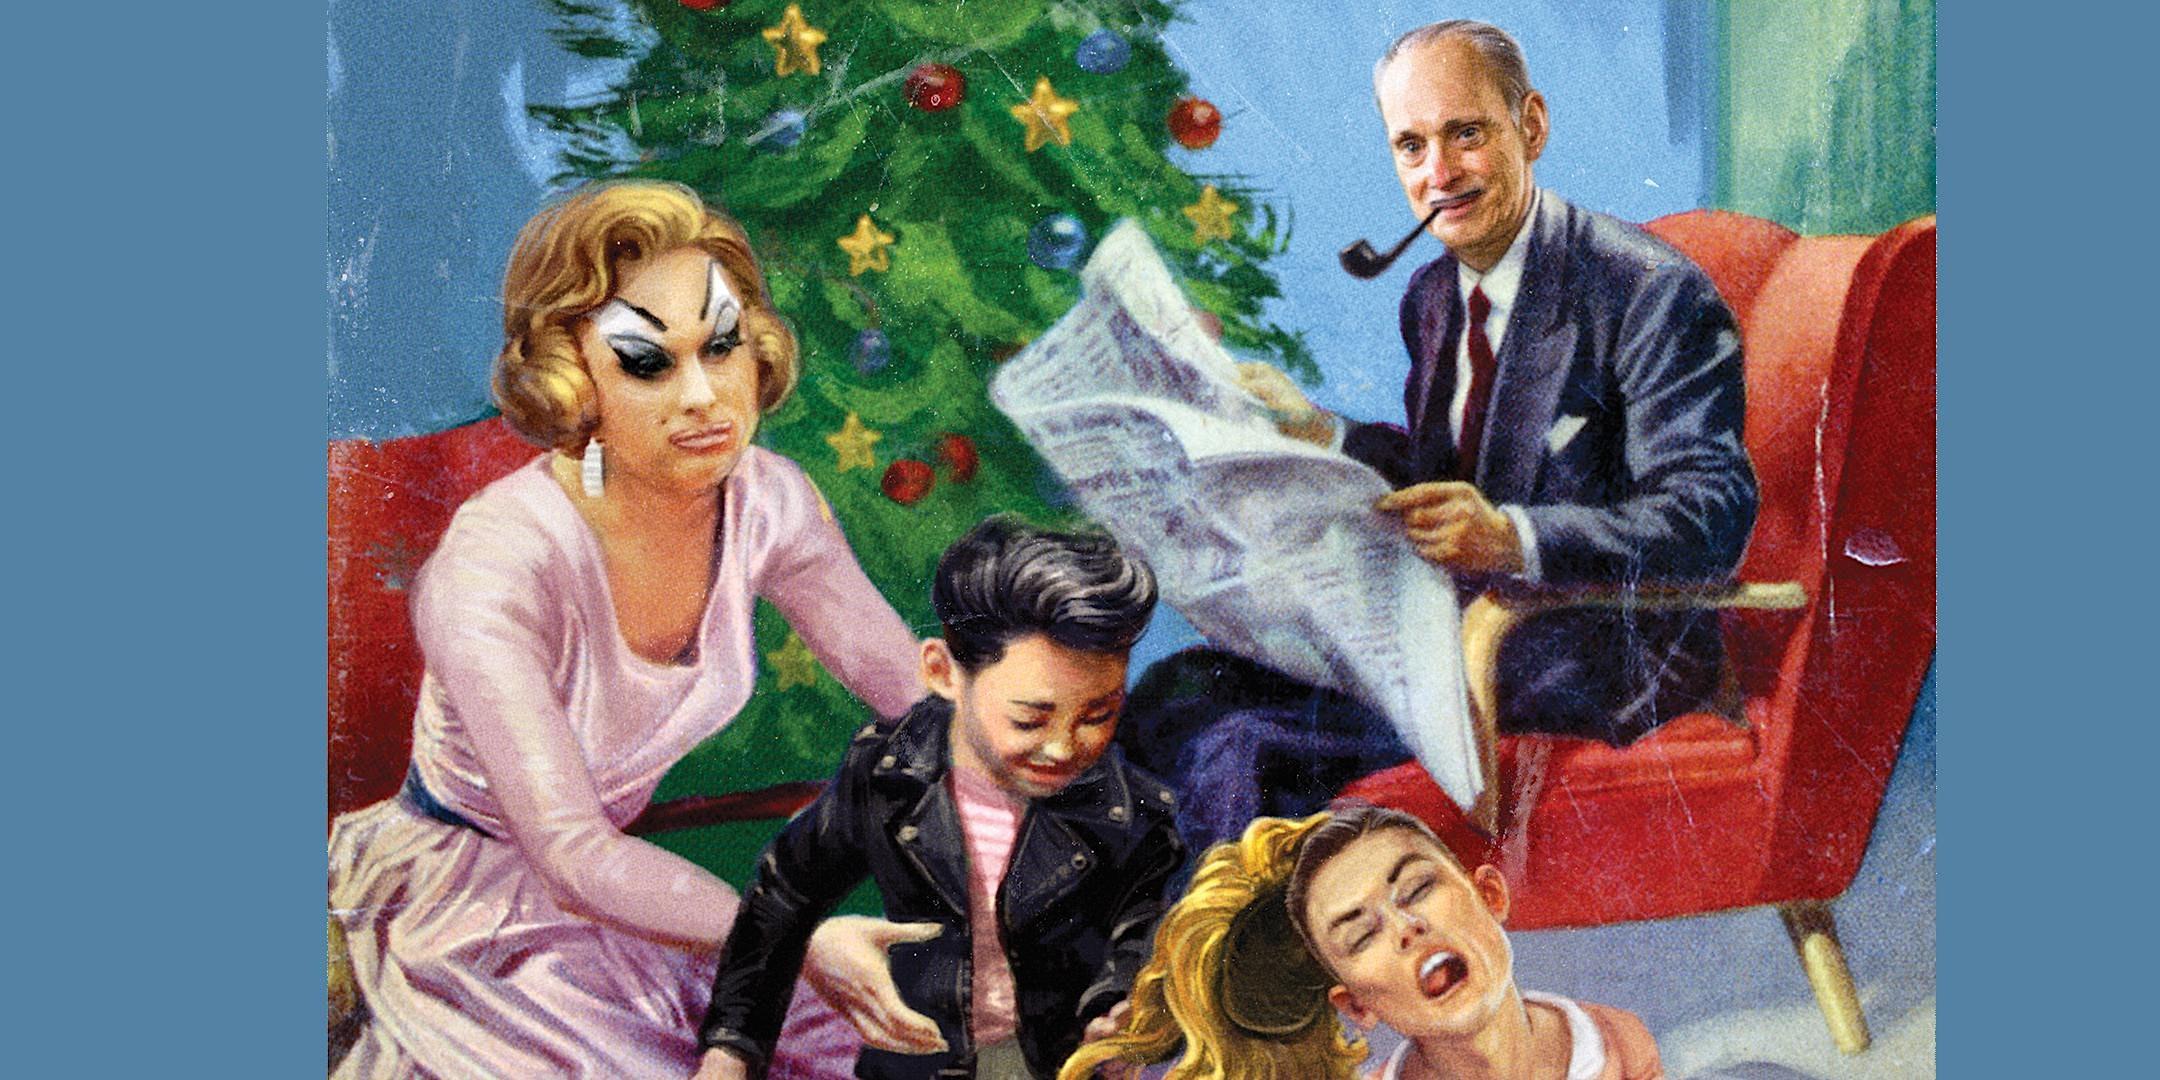 A John Waters Christmas   It's a Yuletide Massacre   1 DEC 2020